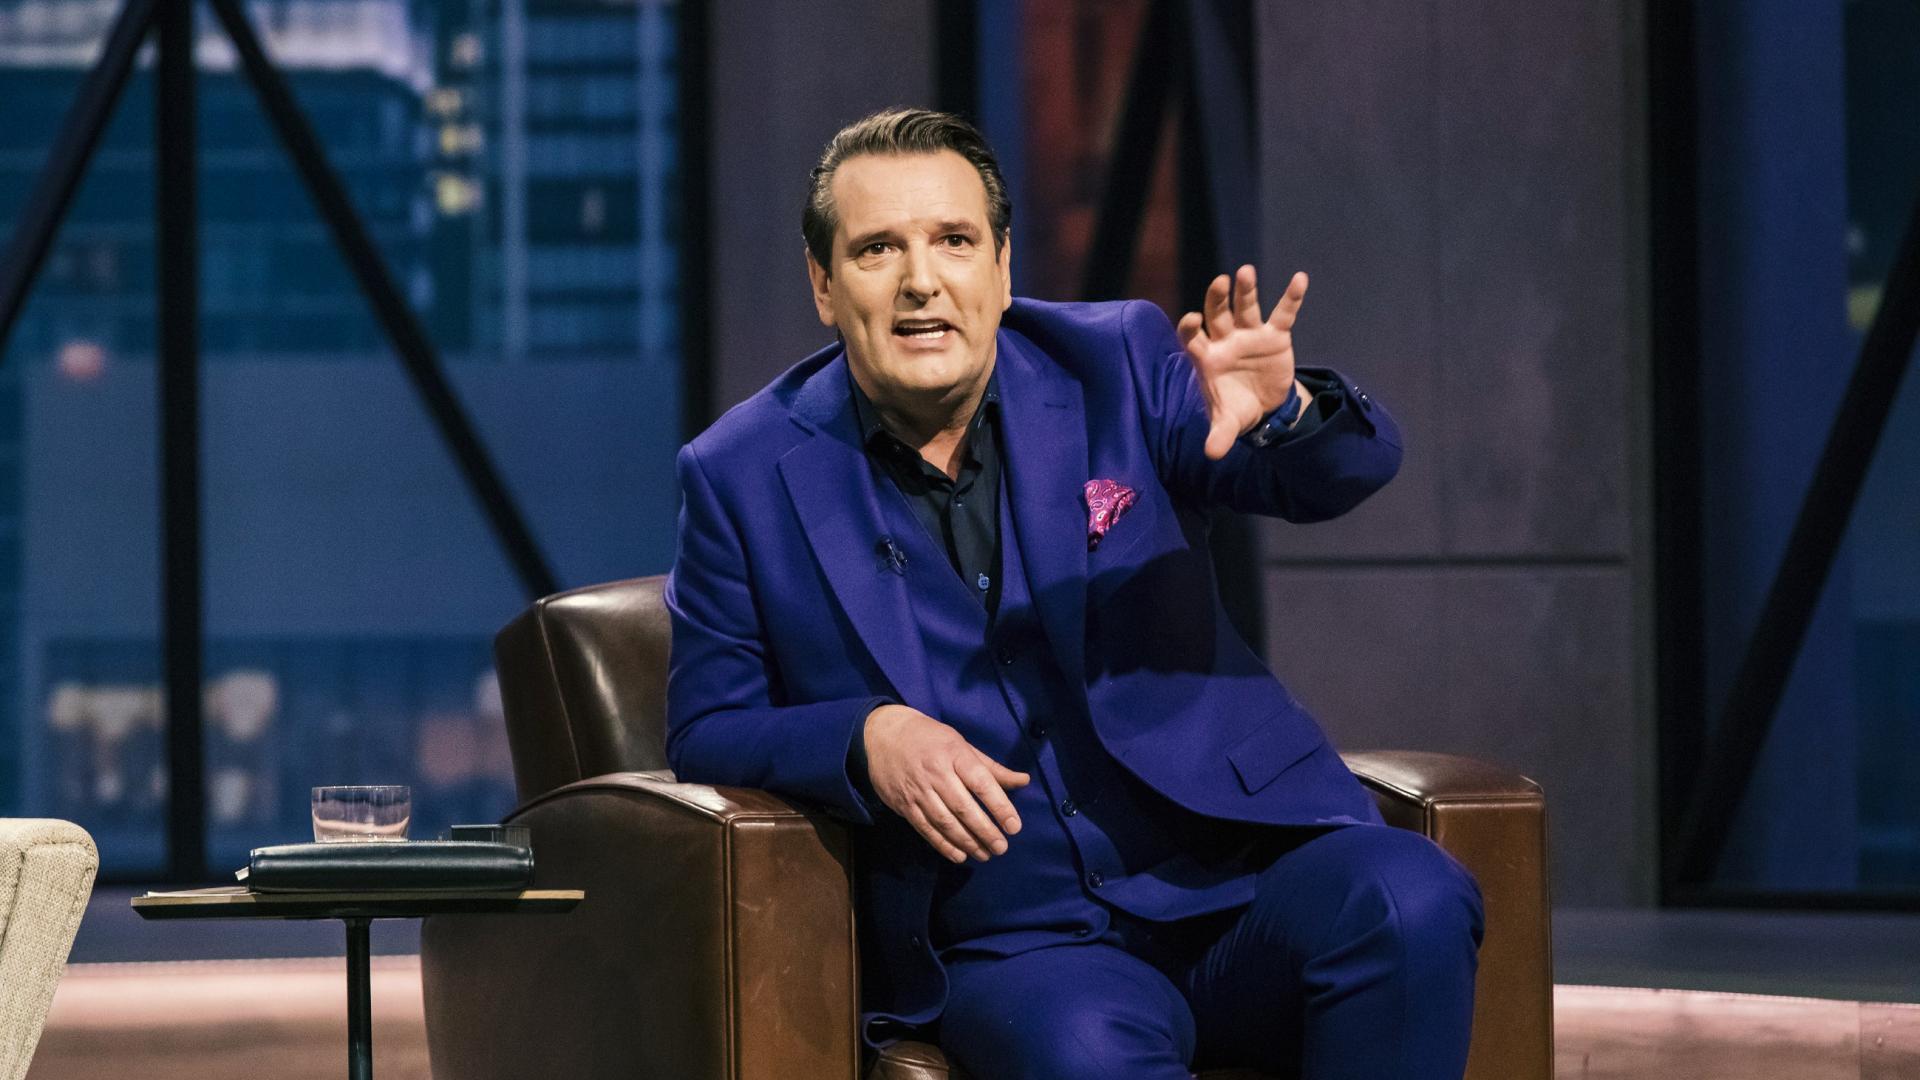 Ralf Dümmel Höhle der Löwen Investor Jury